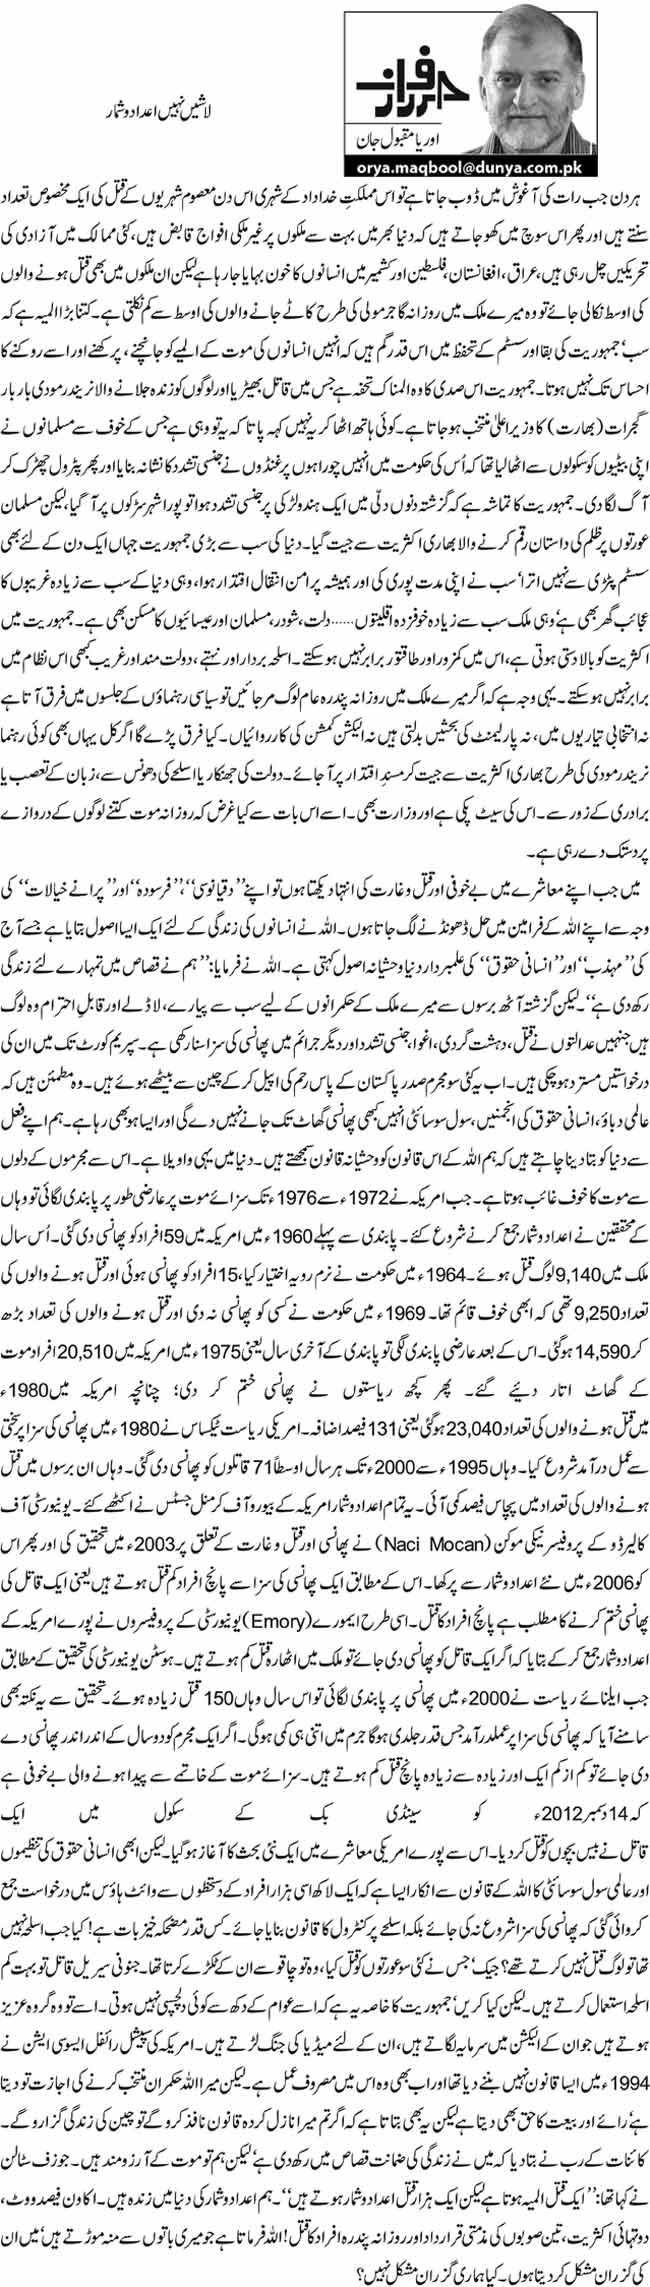 Print Media Coverage Daily Dunya News - Orya Maqbool Jan